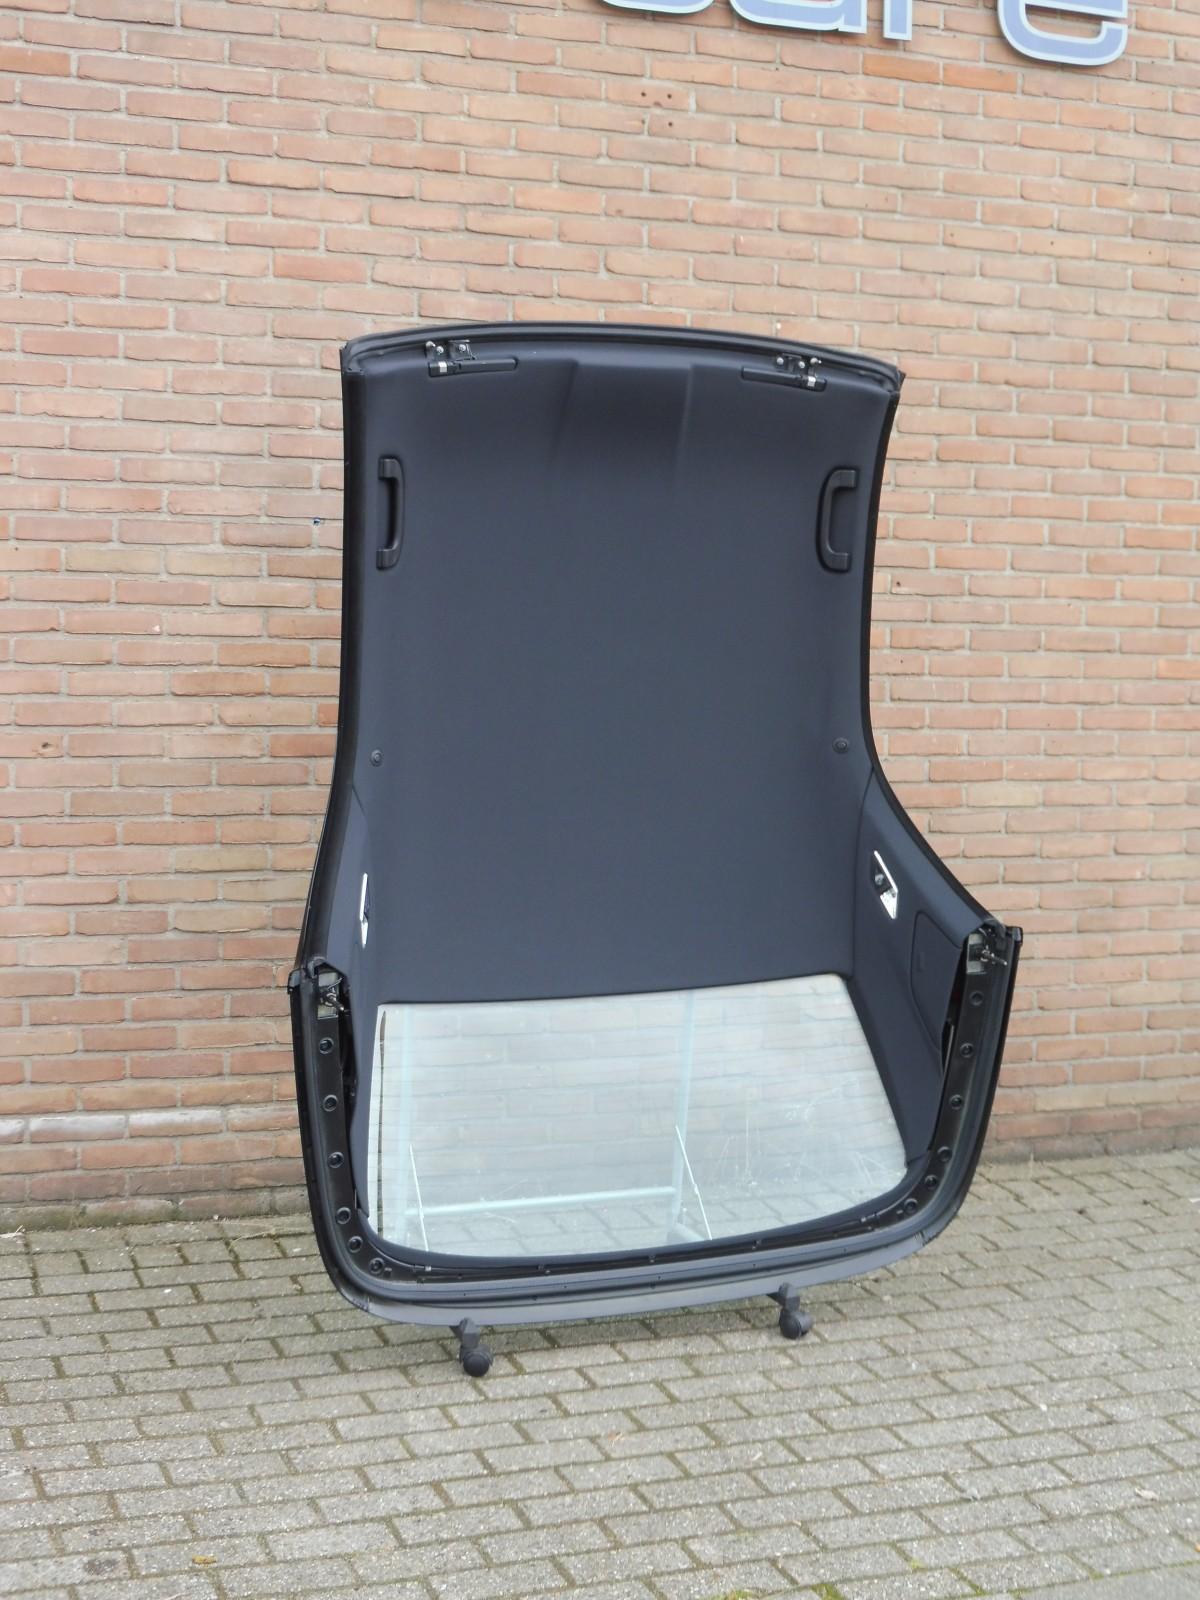 hardtop bmw e46 saphierschwarzmetallic blackline cabrio care. Black Bedroom Furniture Sets. Home Design Ideas